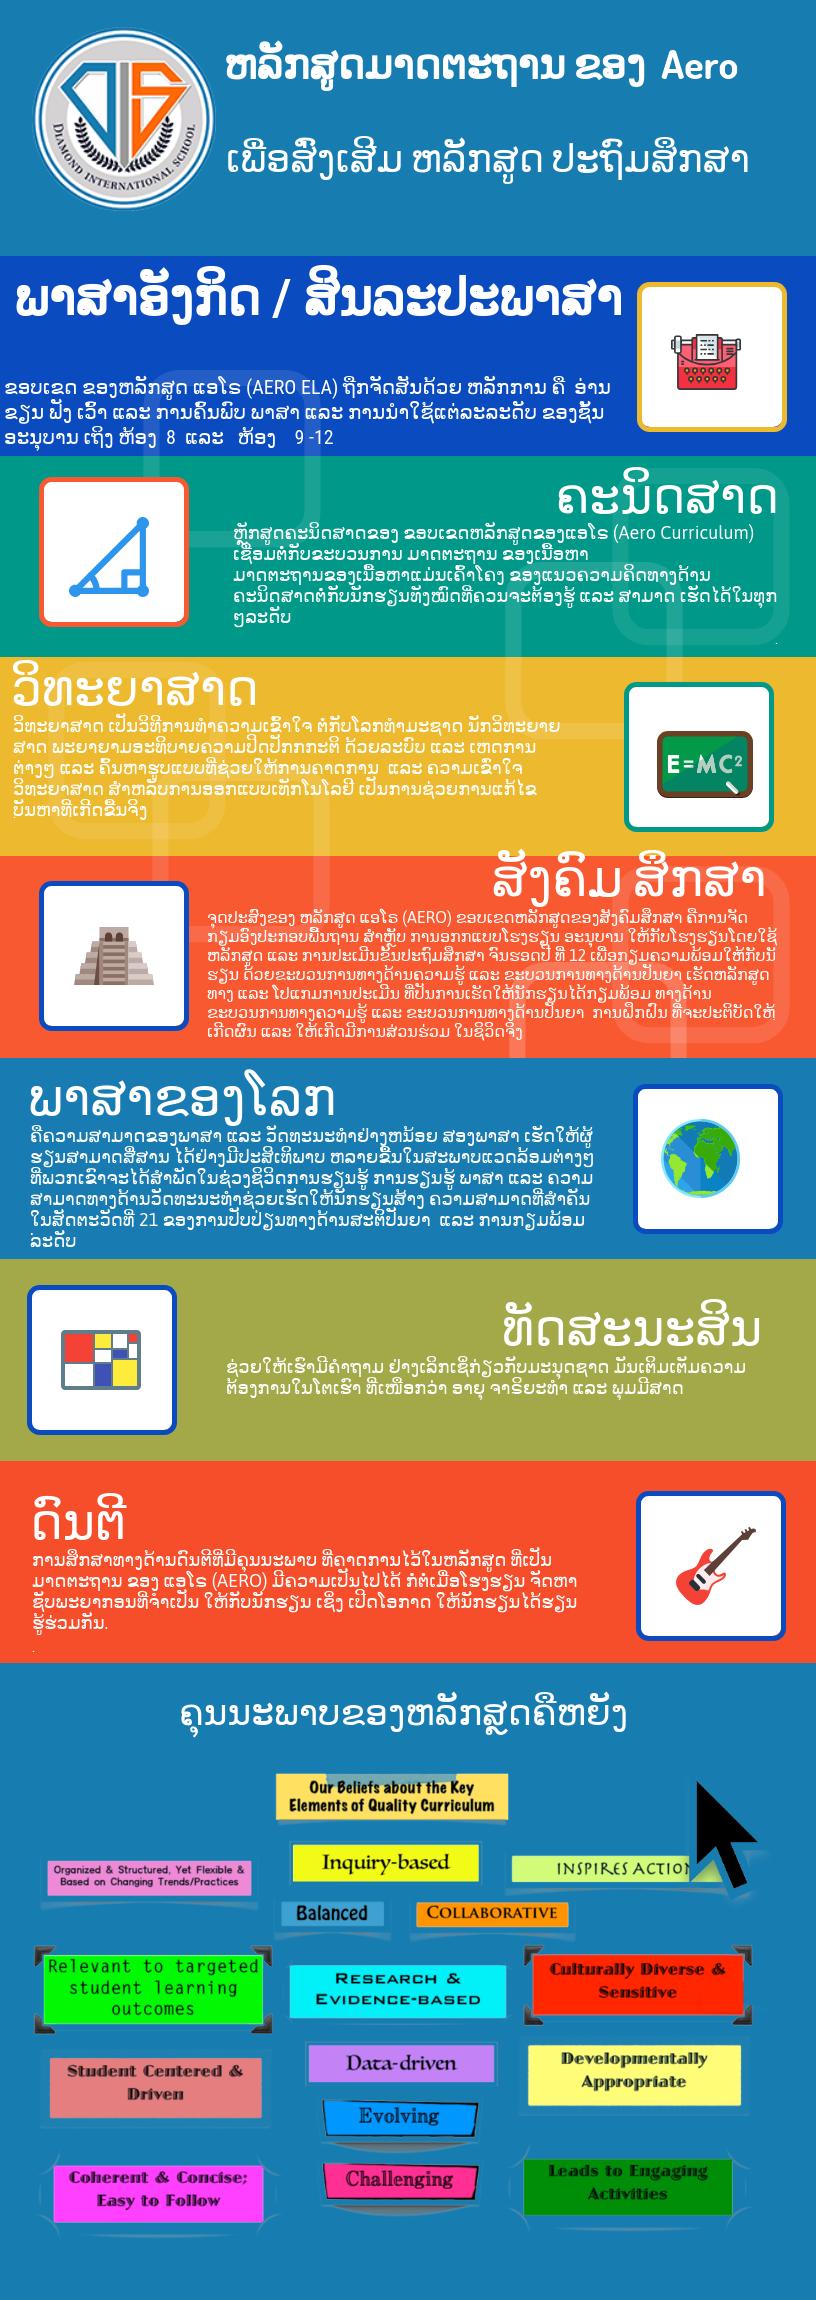 RERO page-Laos.png